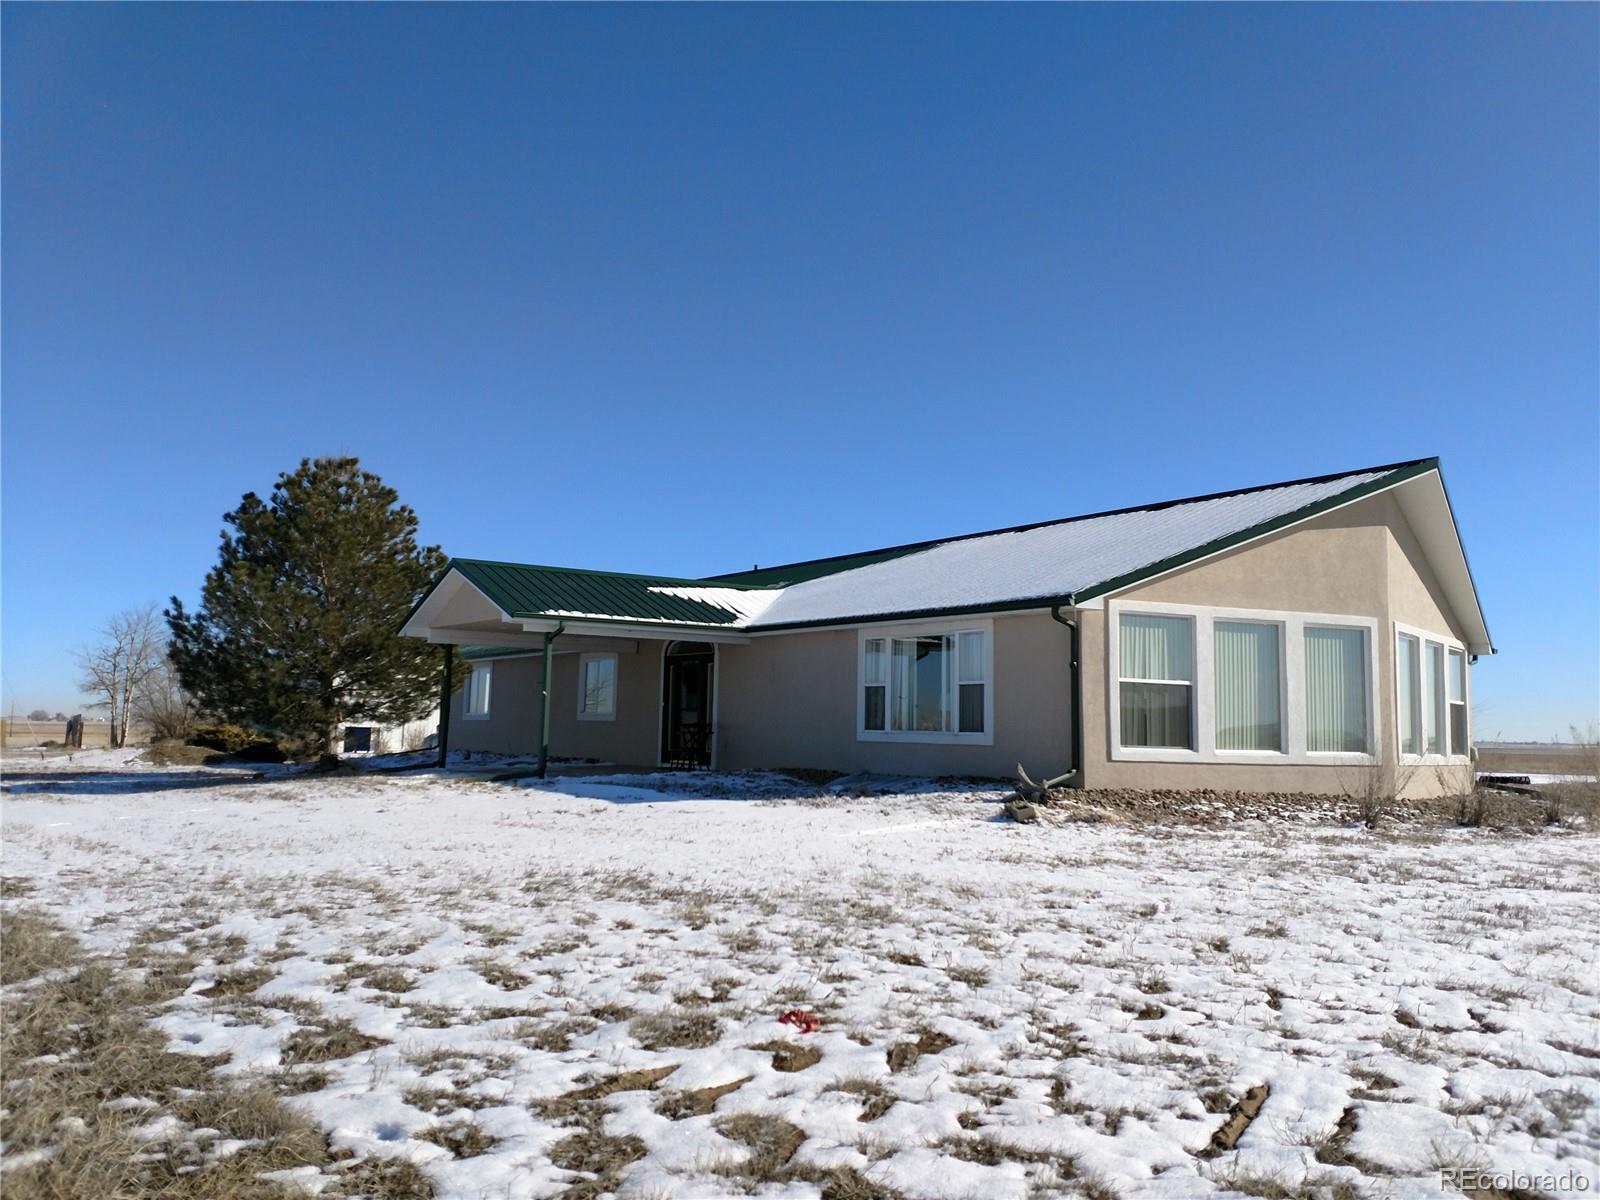 31136 County Road 18, Keenesburg, CO 80643 - Keenesburg, CO real estate listing